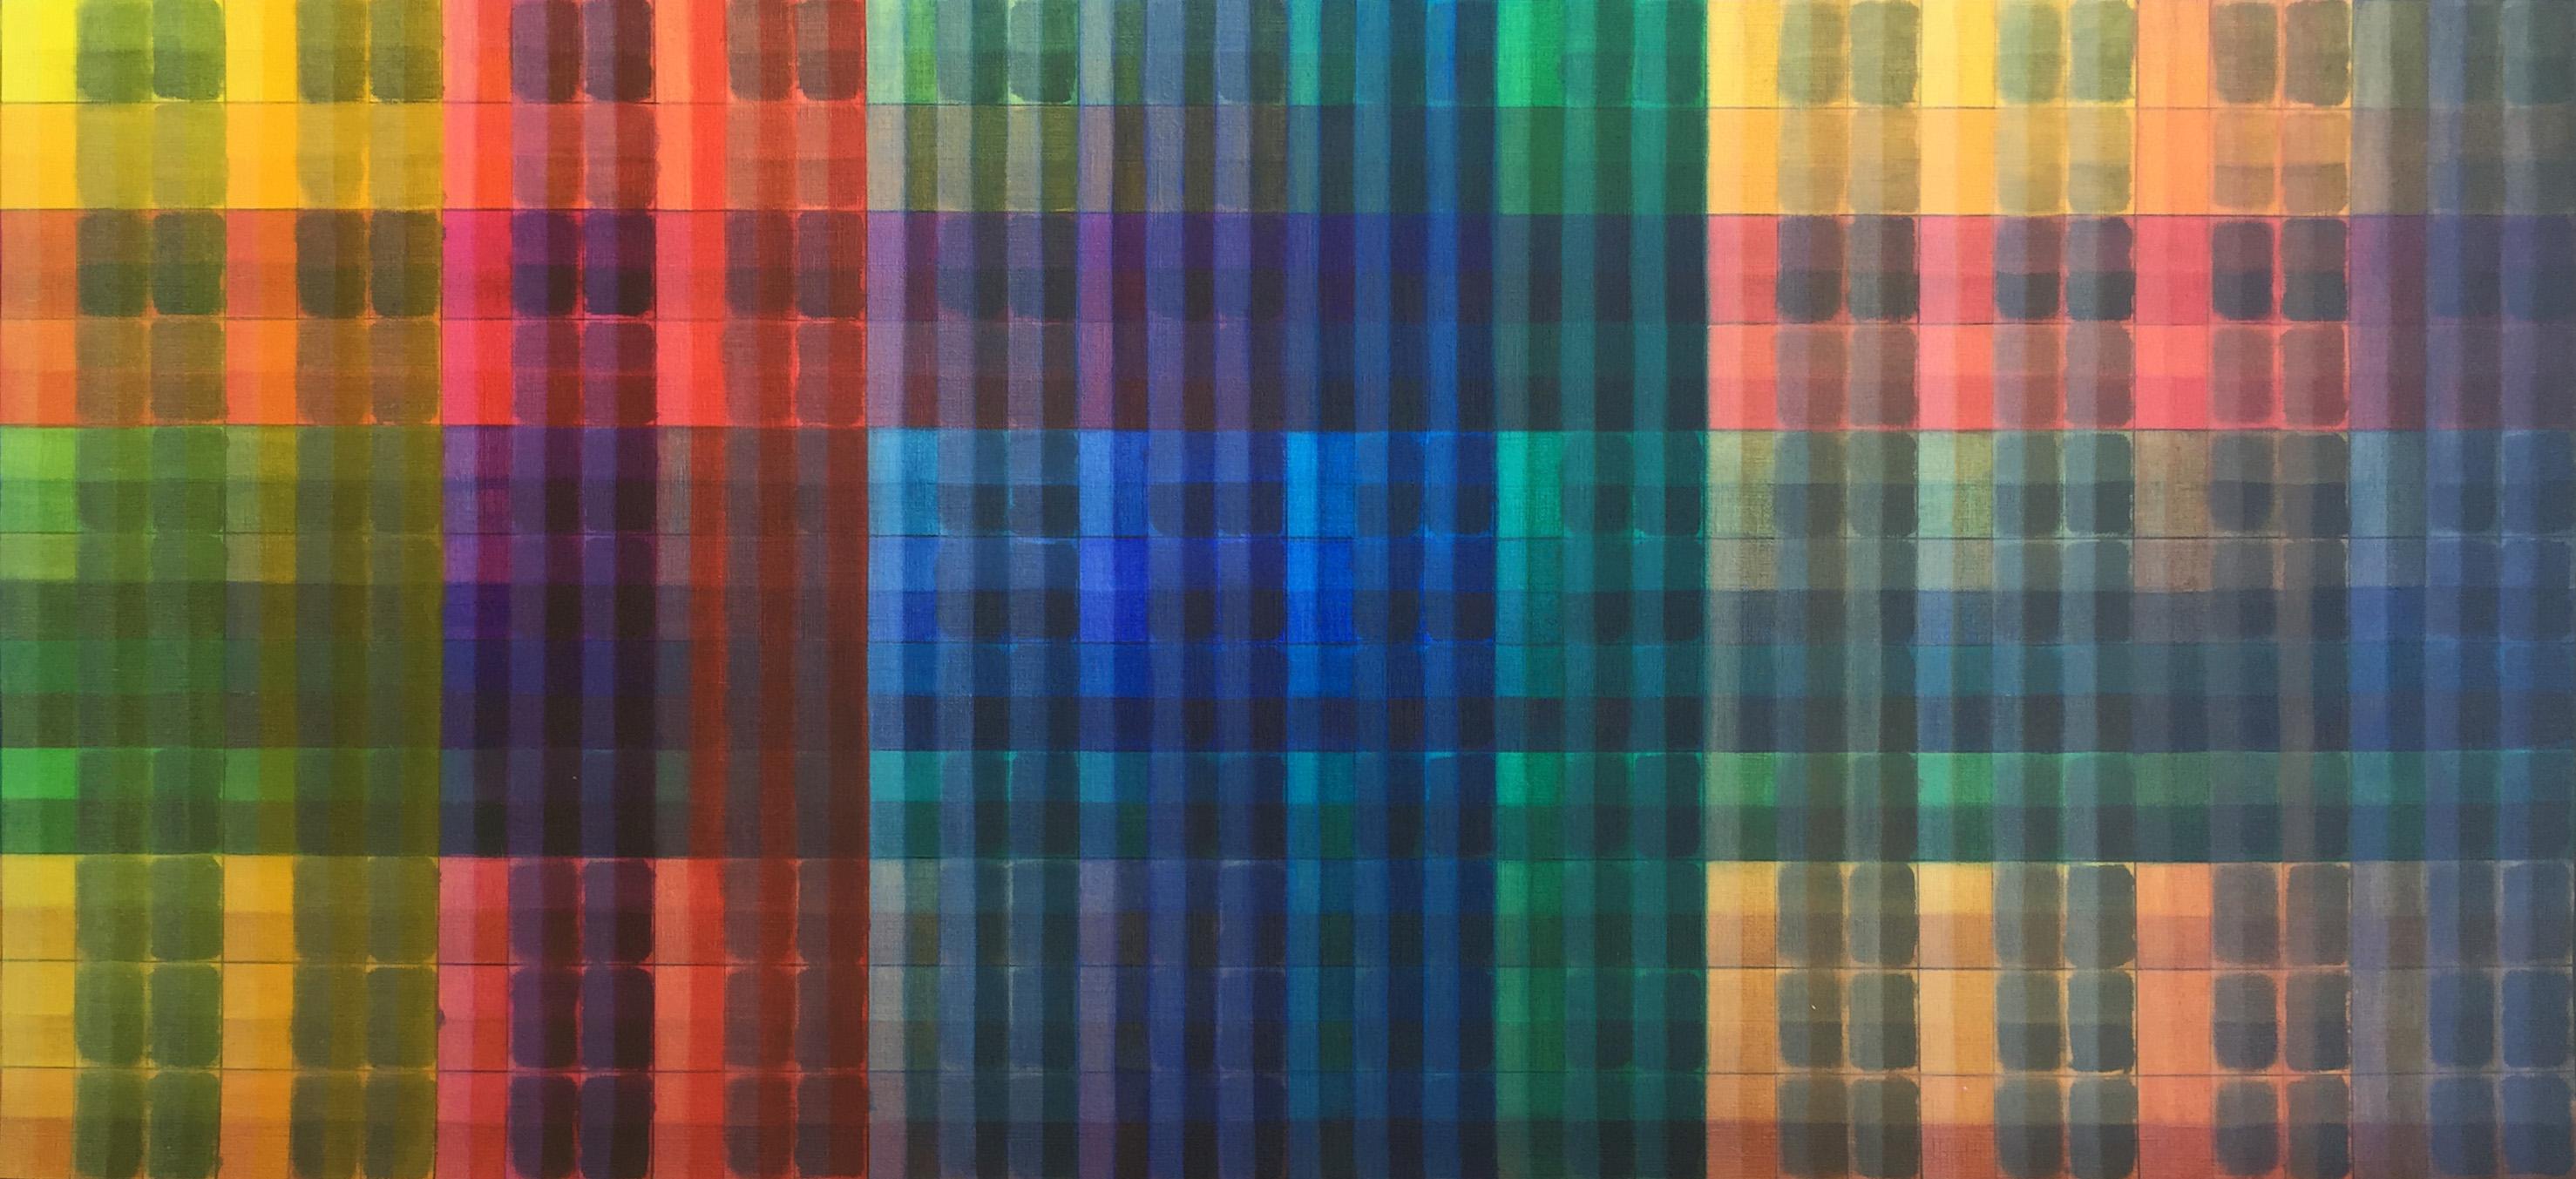 Multi-coloured patterned artwork